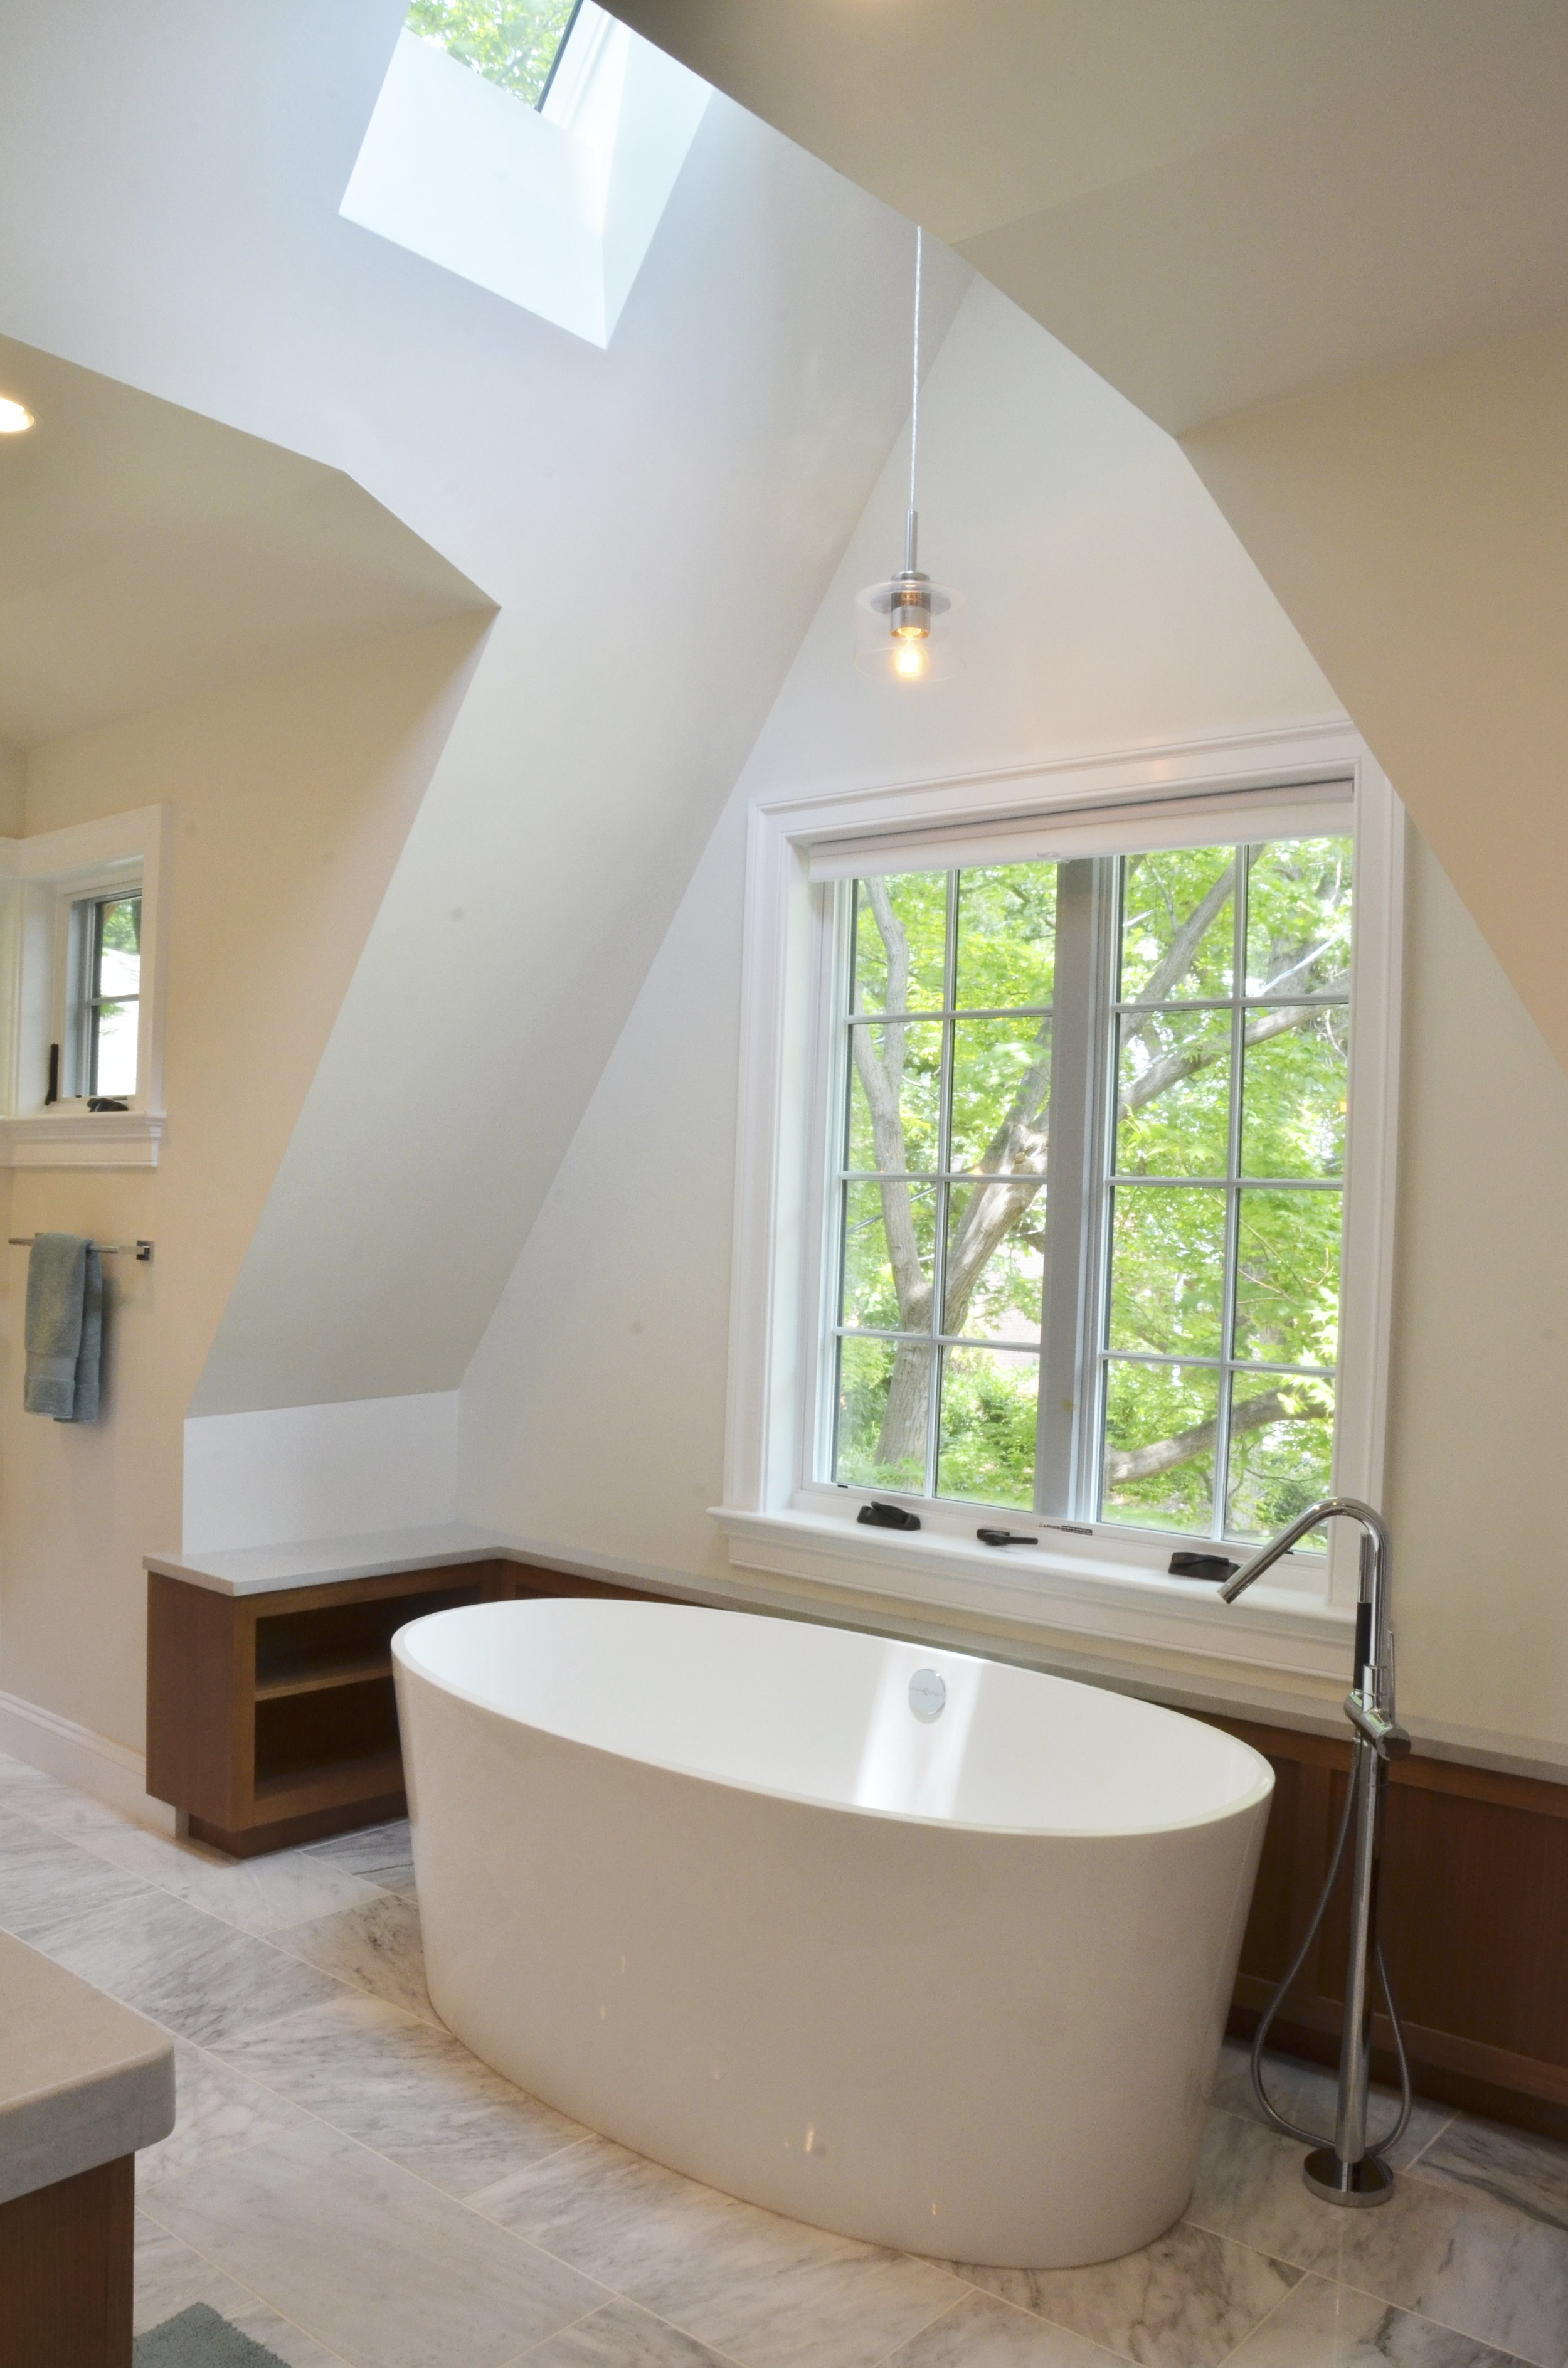 New Bay for Soaking Bath